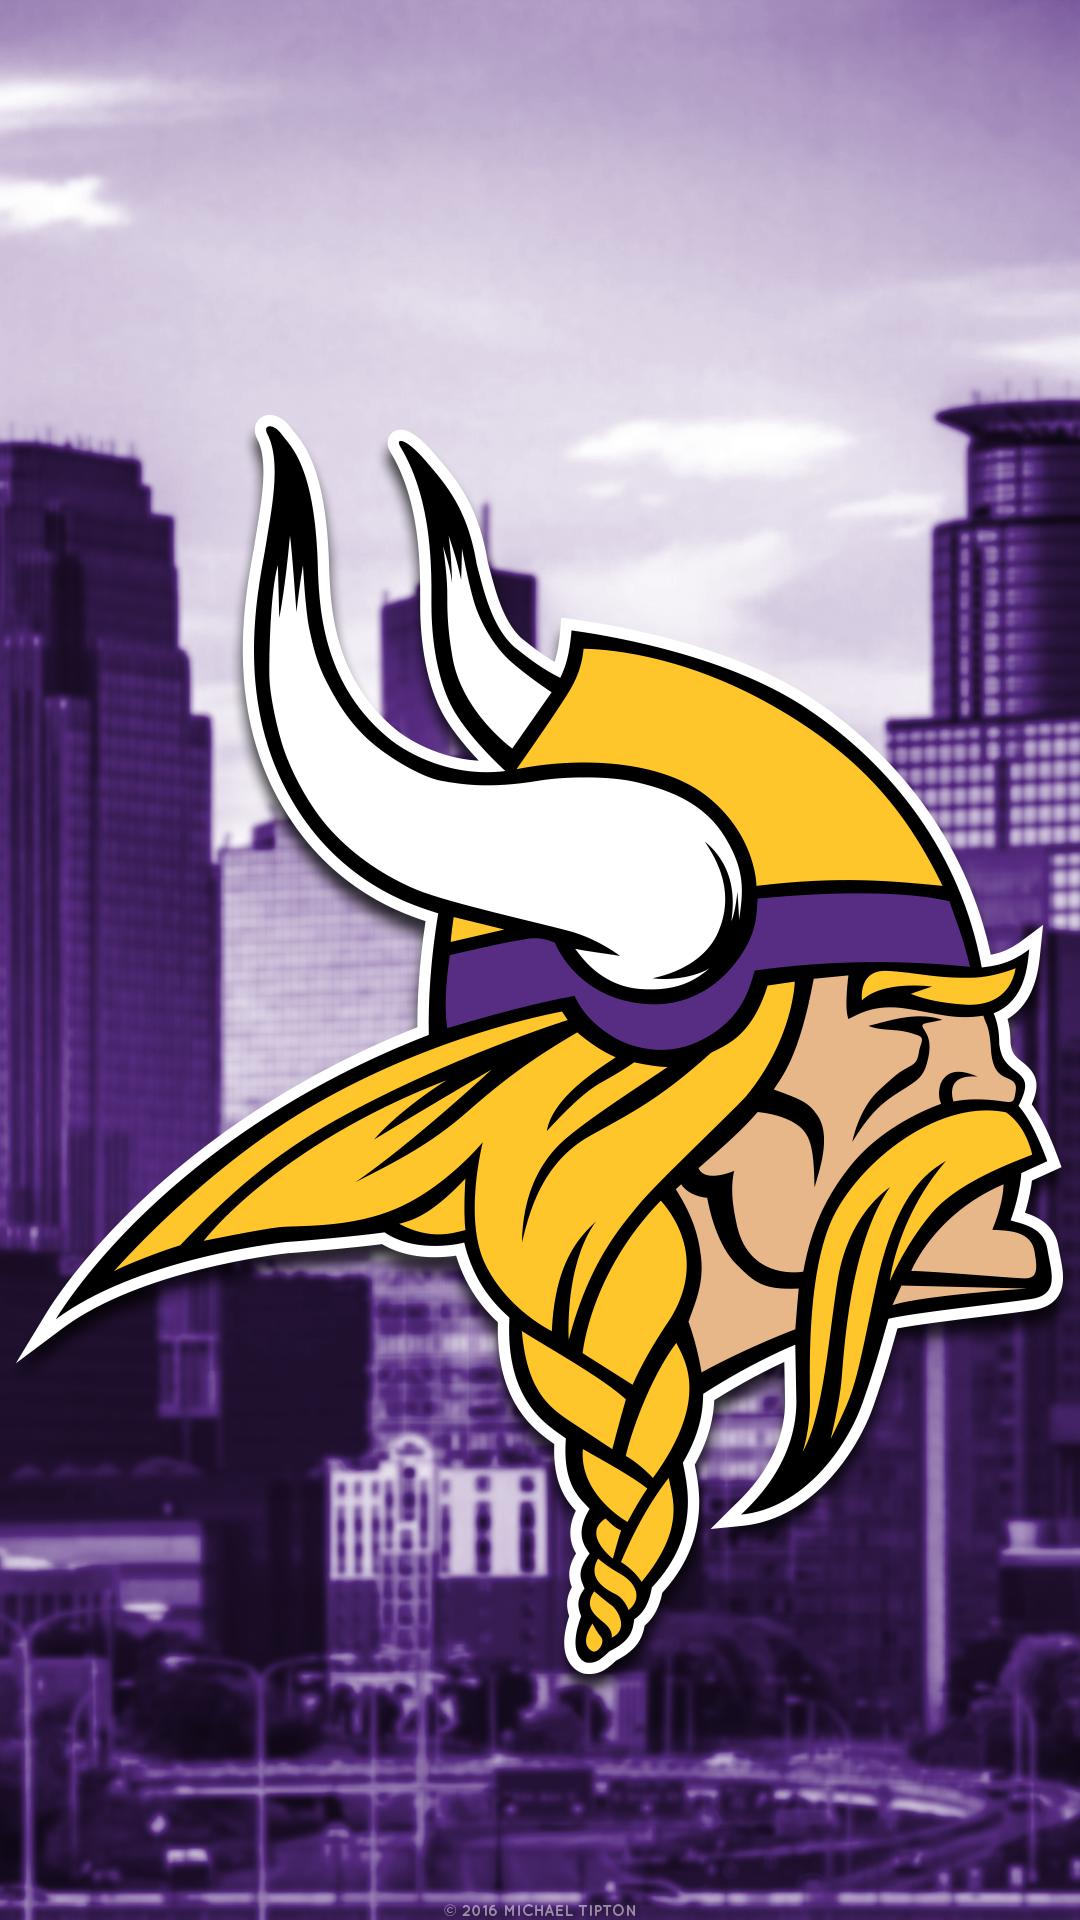 Minnesota Vikings HD Wallpapers Backgrounds Wallpaper | zacorius | Pinterest | Minnesota vikings ...